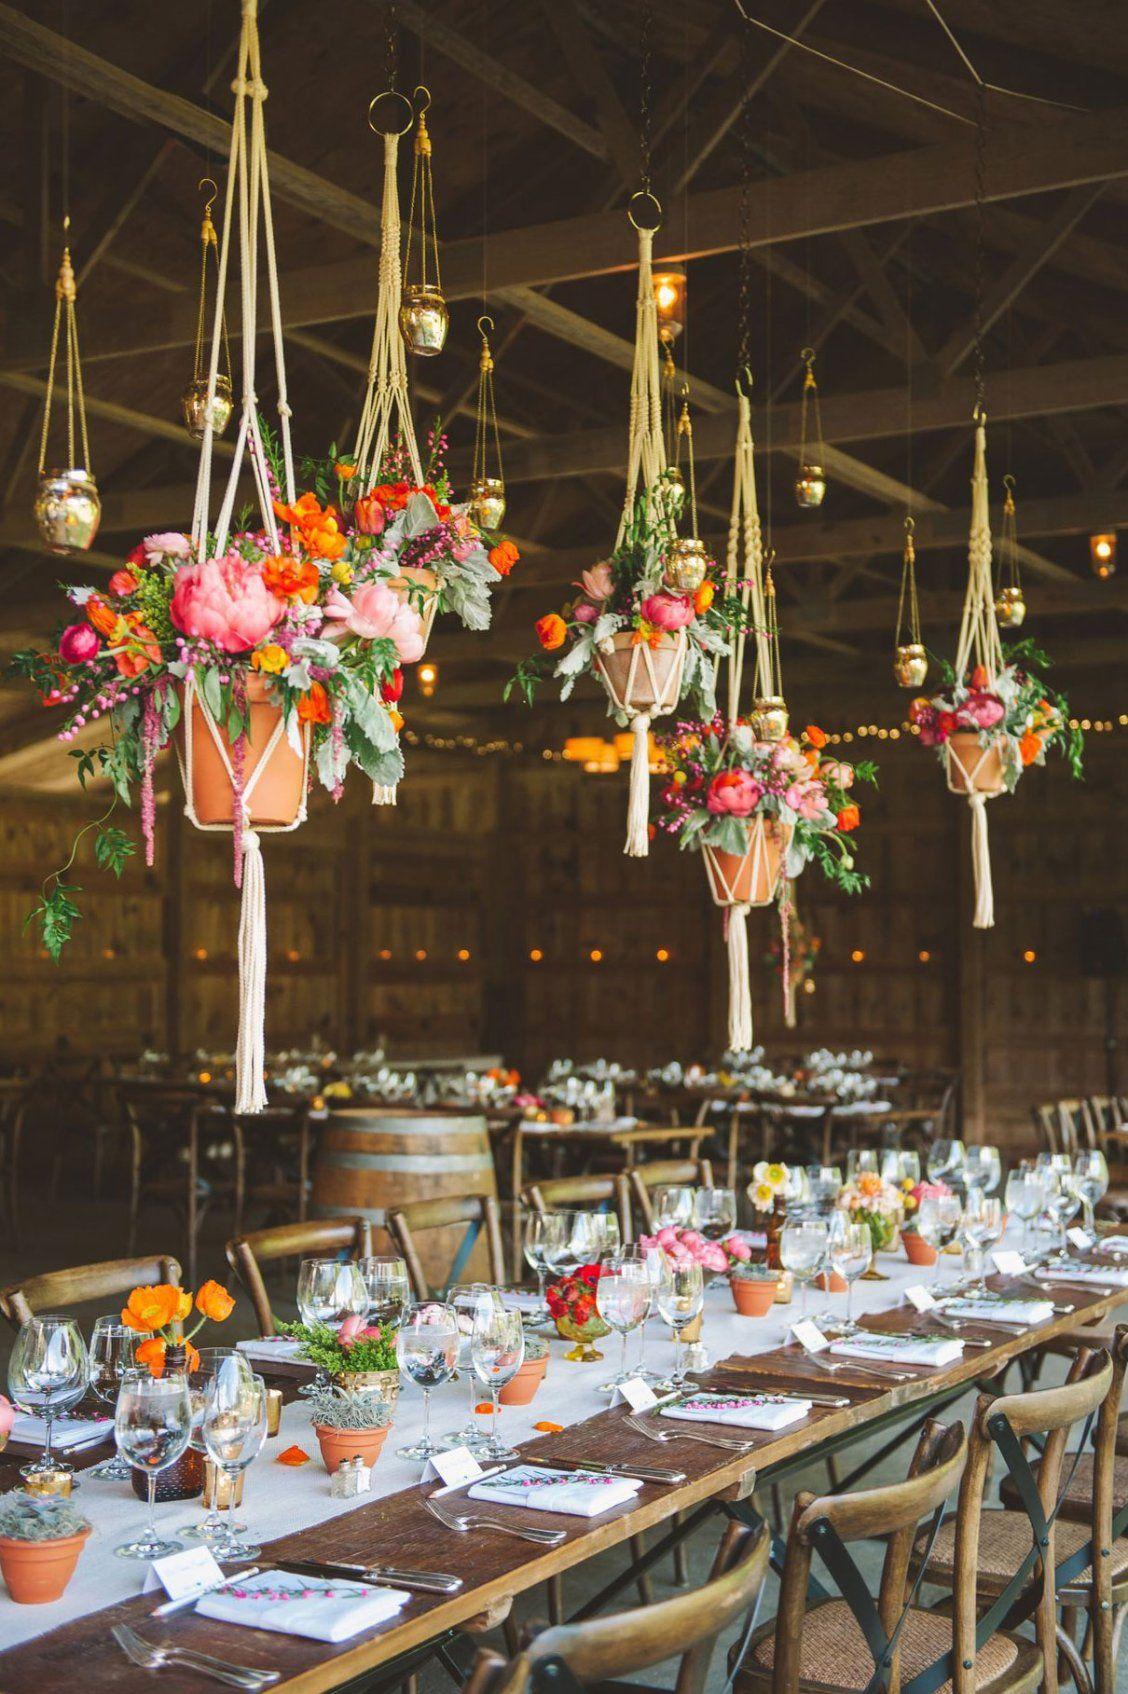 20 (Easy!) Ways to Decorate Your Wedding Reception #weddingreception